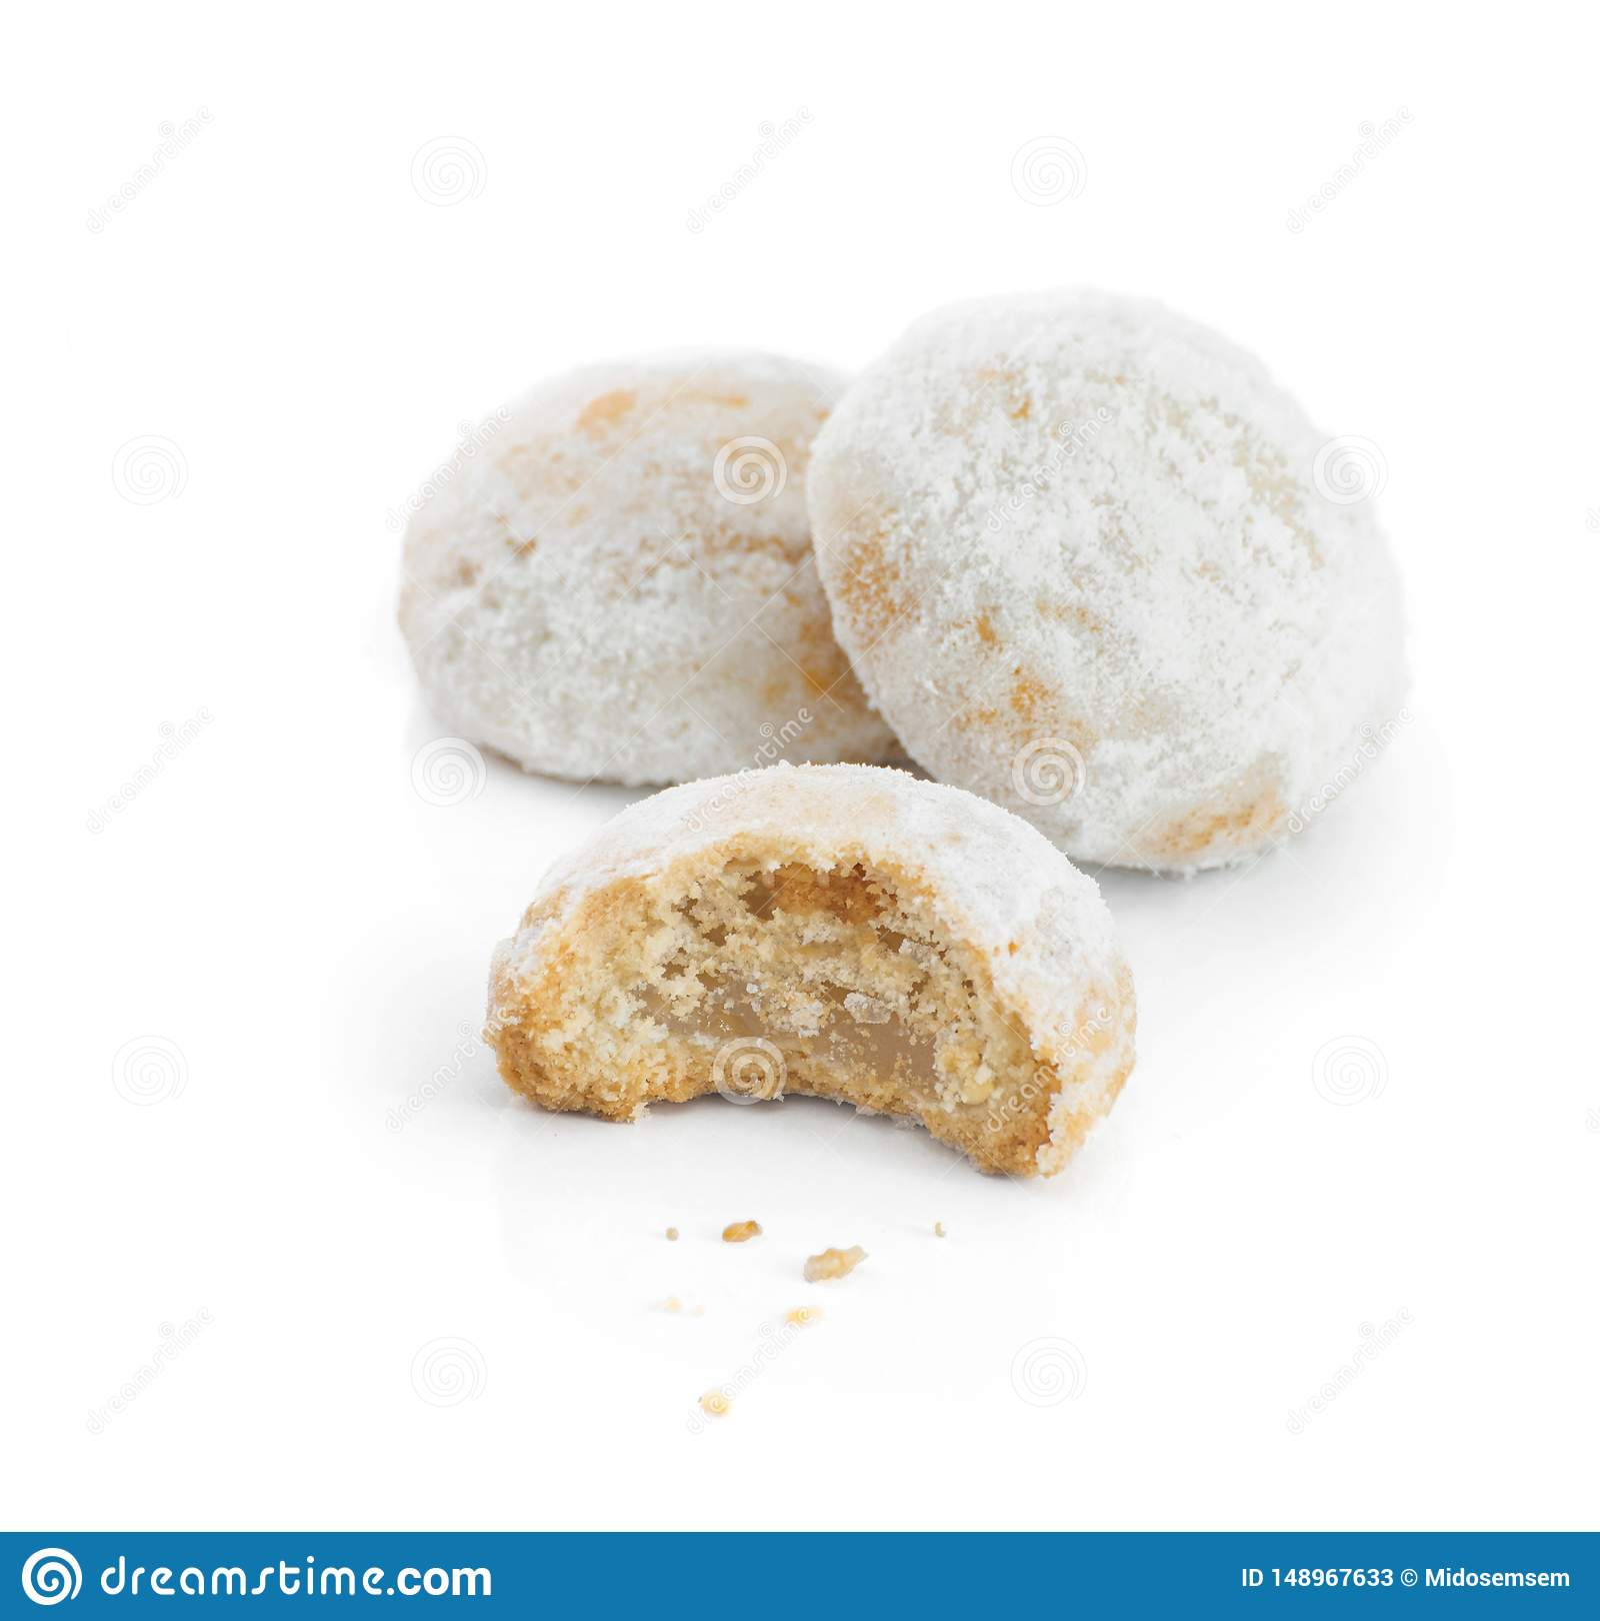 Sweet Eid El Fitr Cookies, Muslim Lesser Holiday Traditional Food